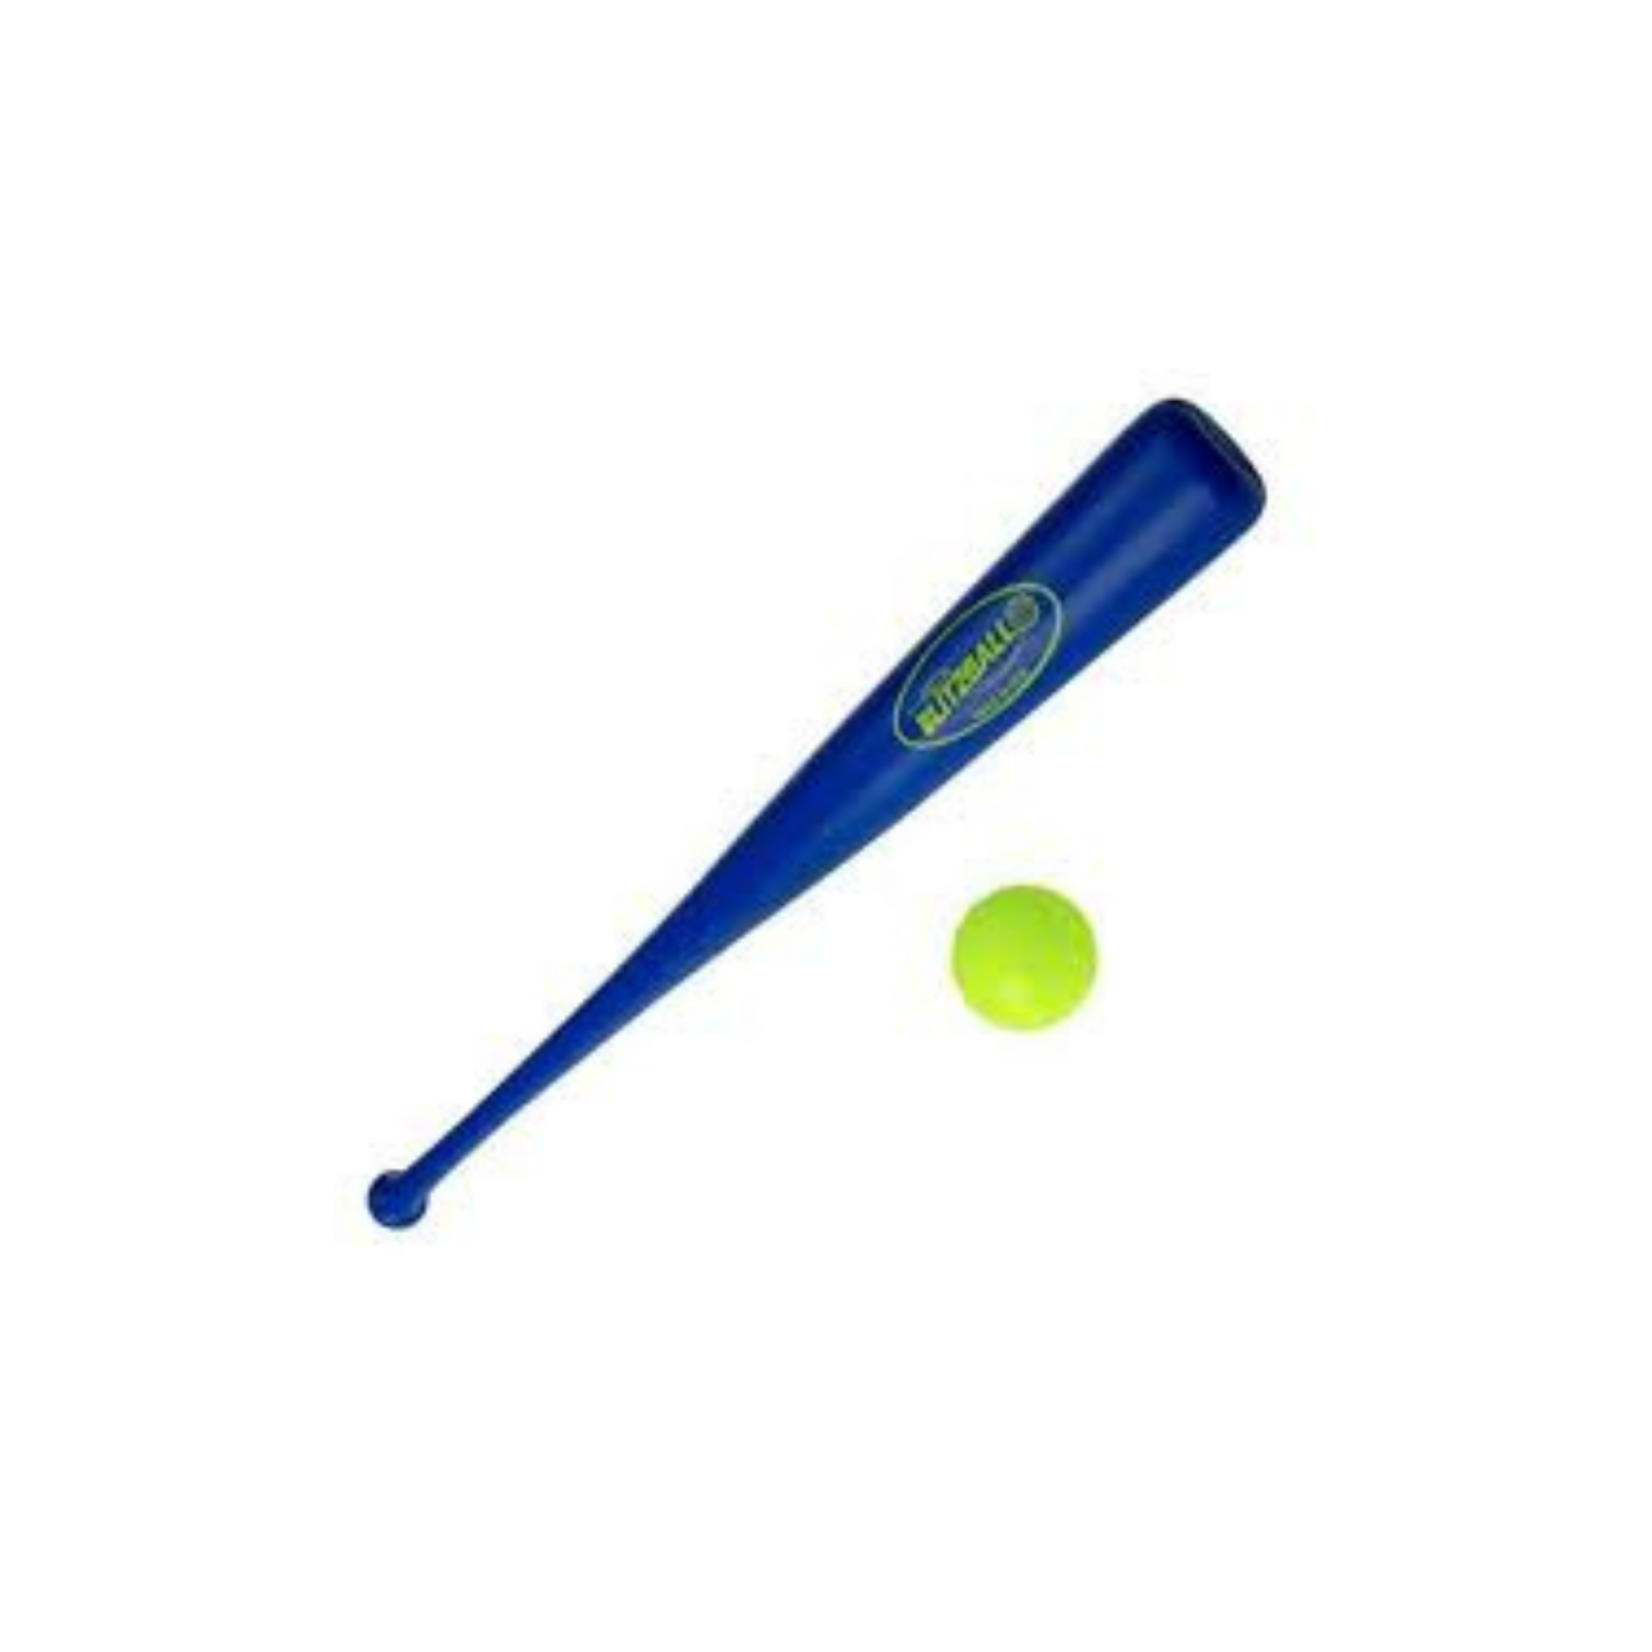 Blitzball/Bat Combo